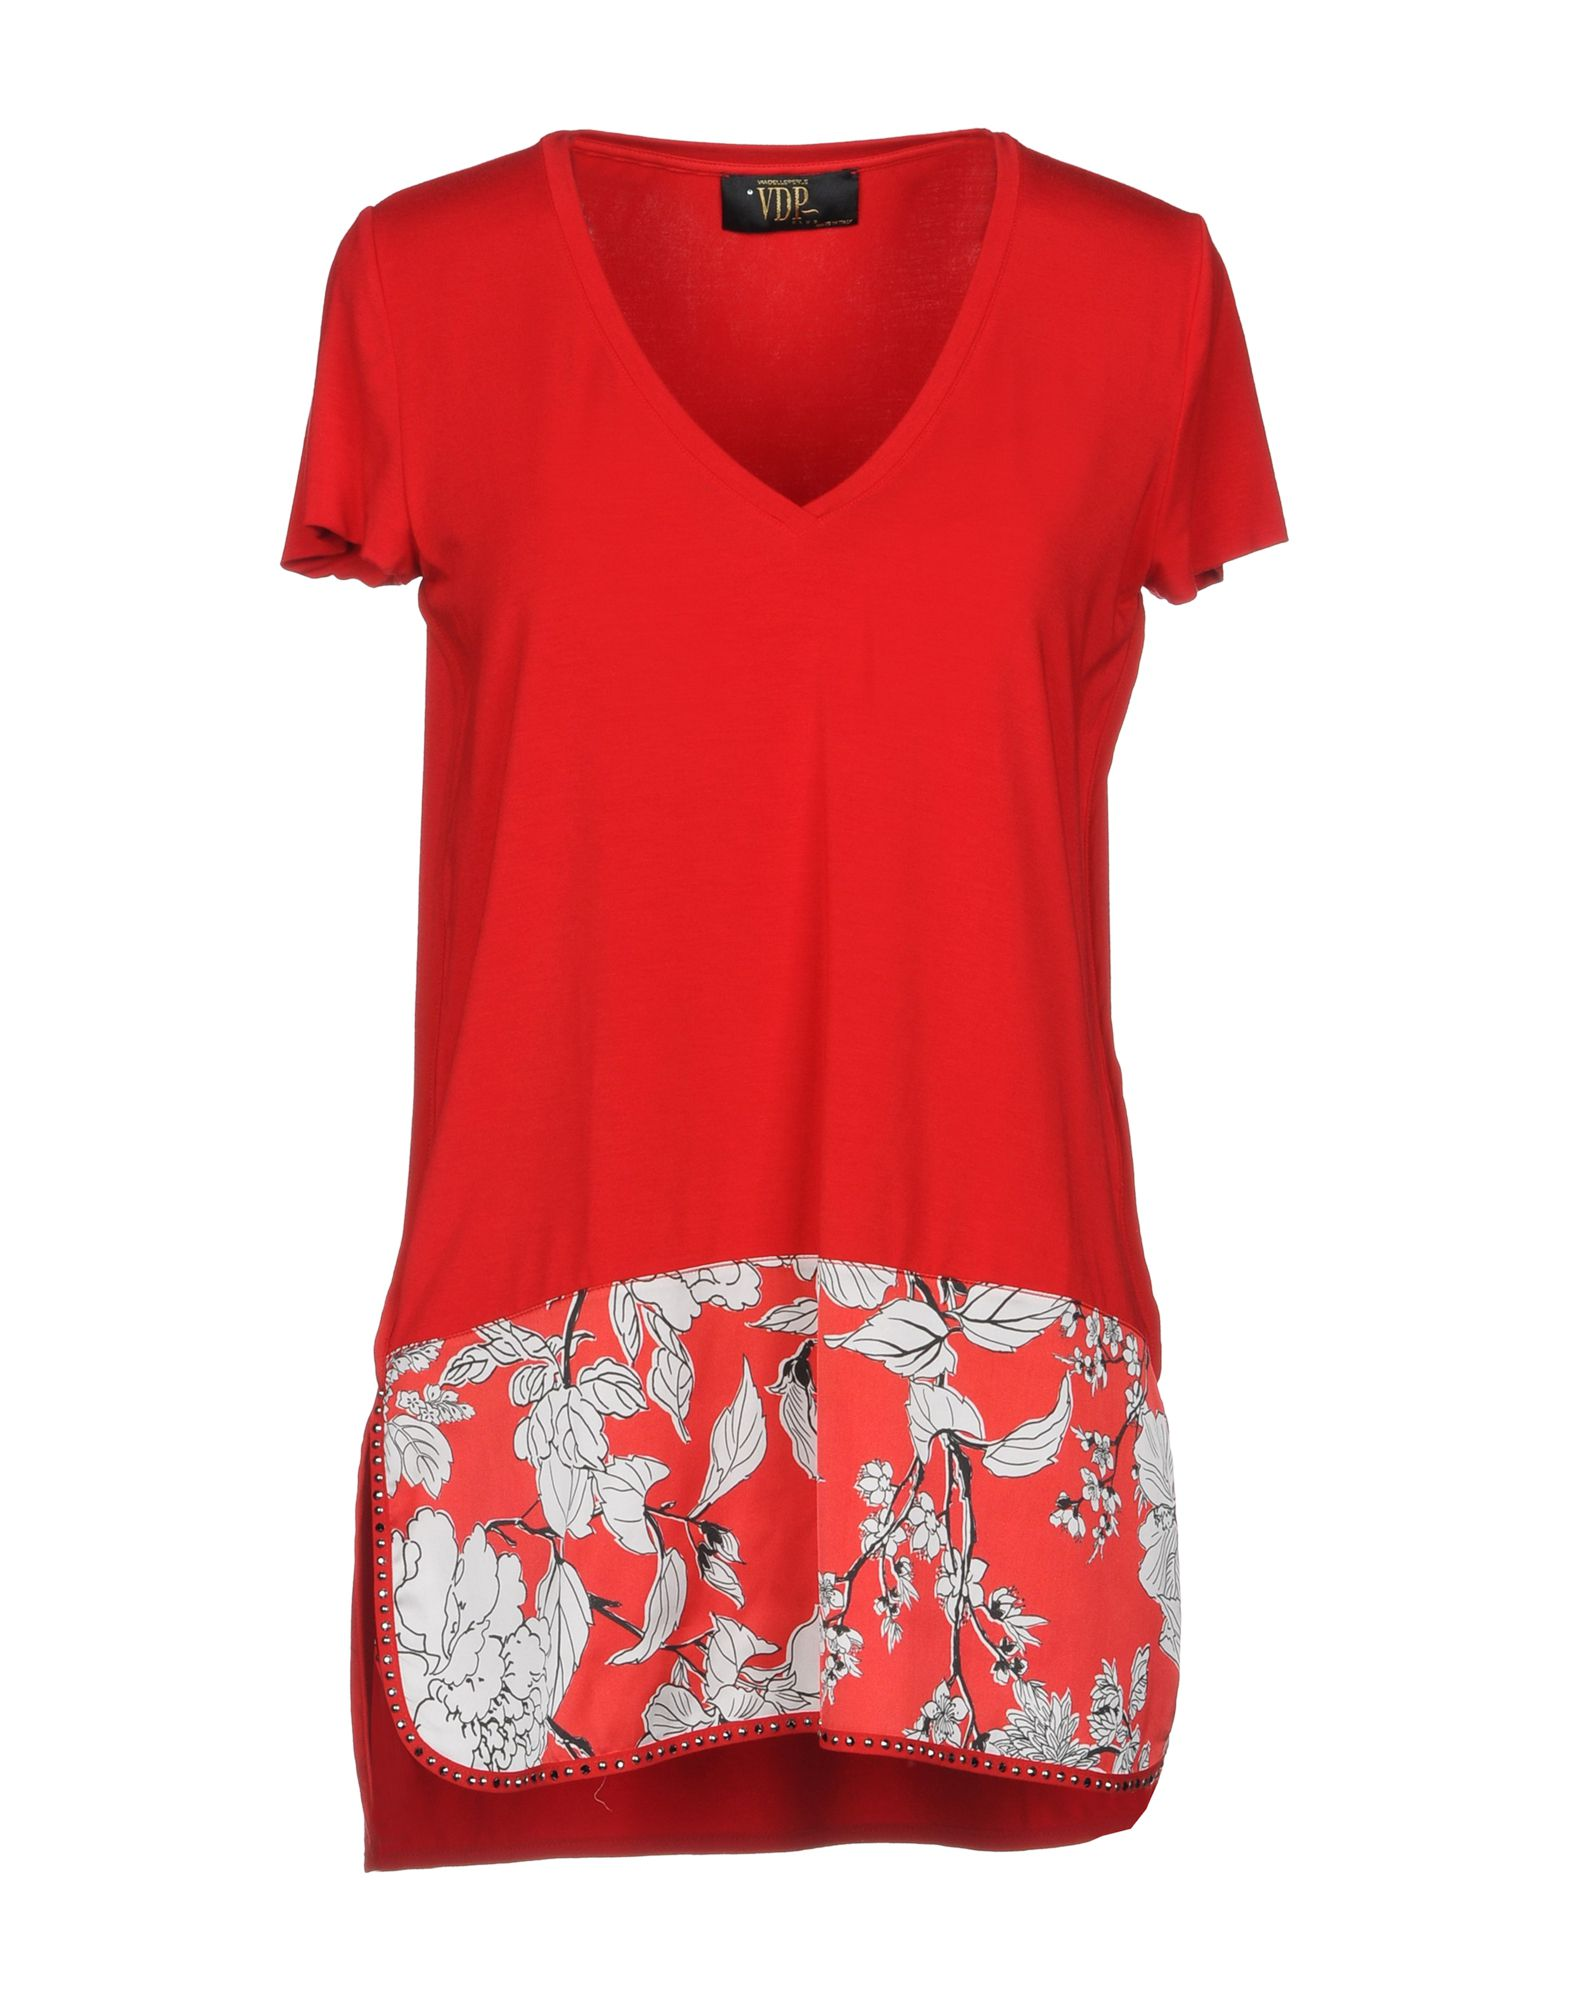 T-Shirt Vdp Club Donna - Acquista online su 7T3NVUl